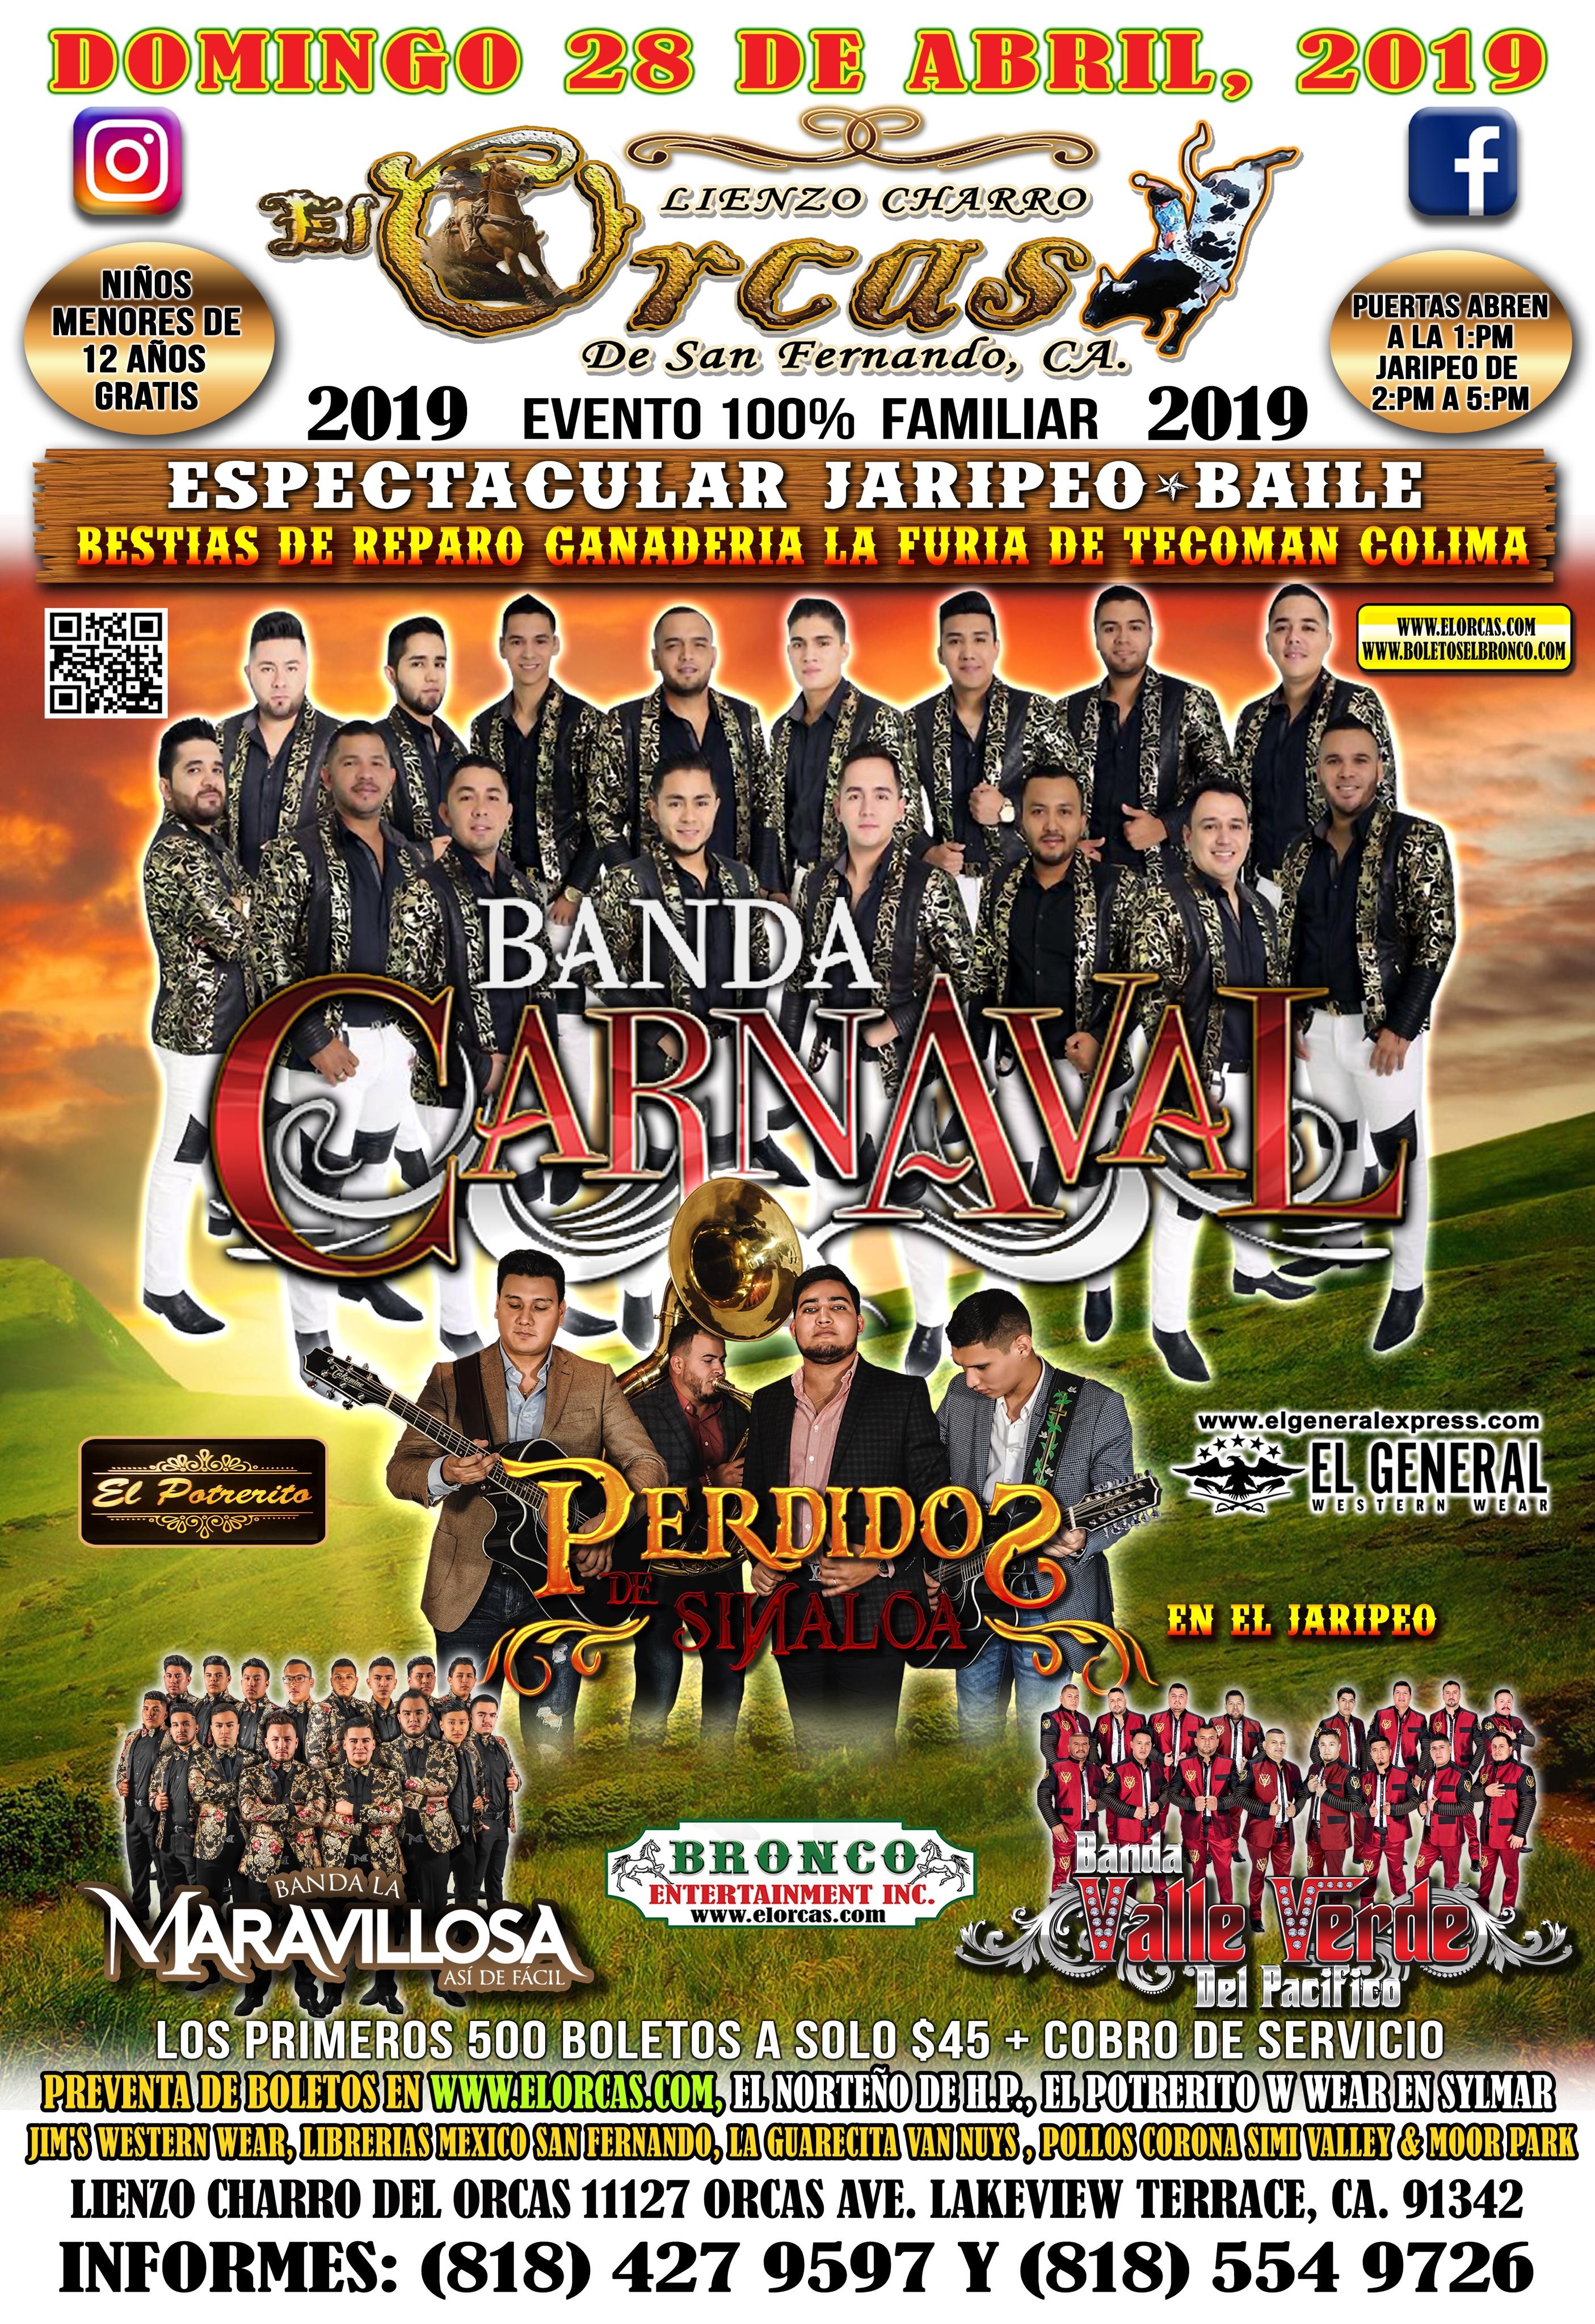 Gran Jaripeo - Banda Carnaval & Perdidos de Sinaloa